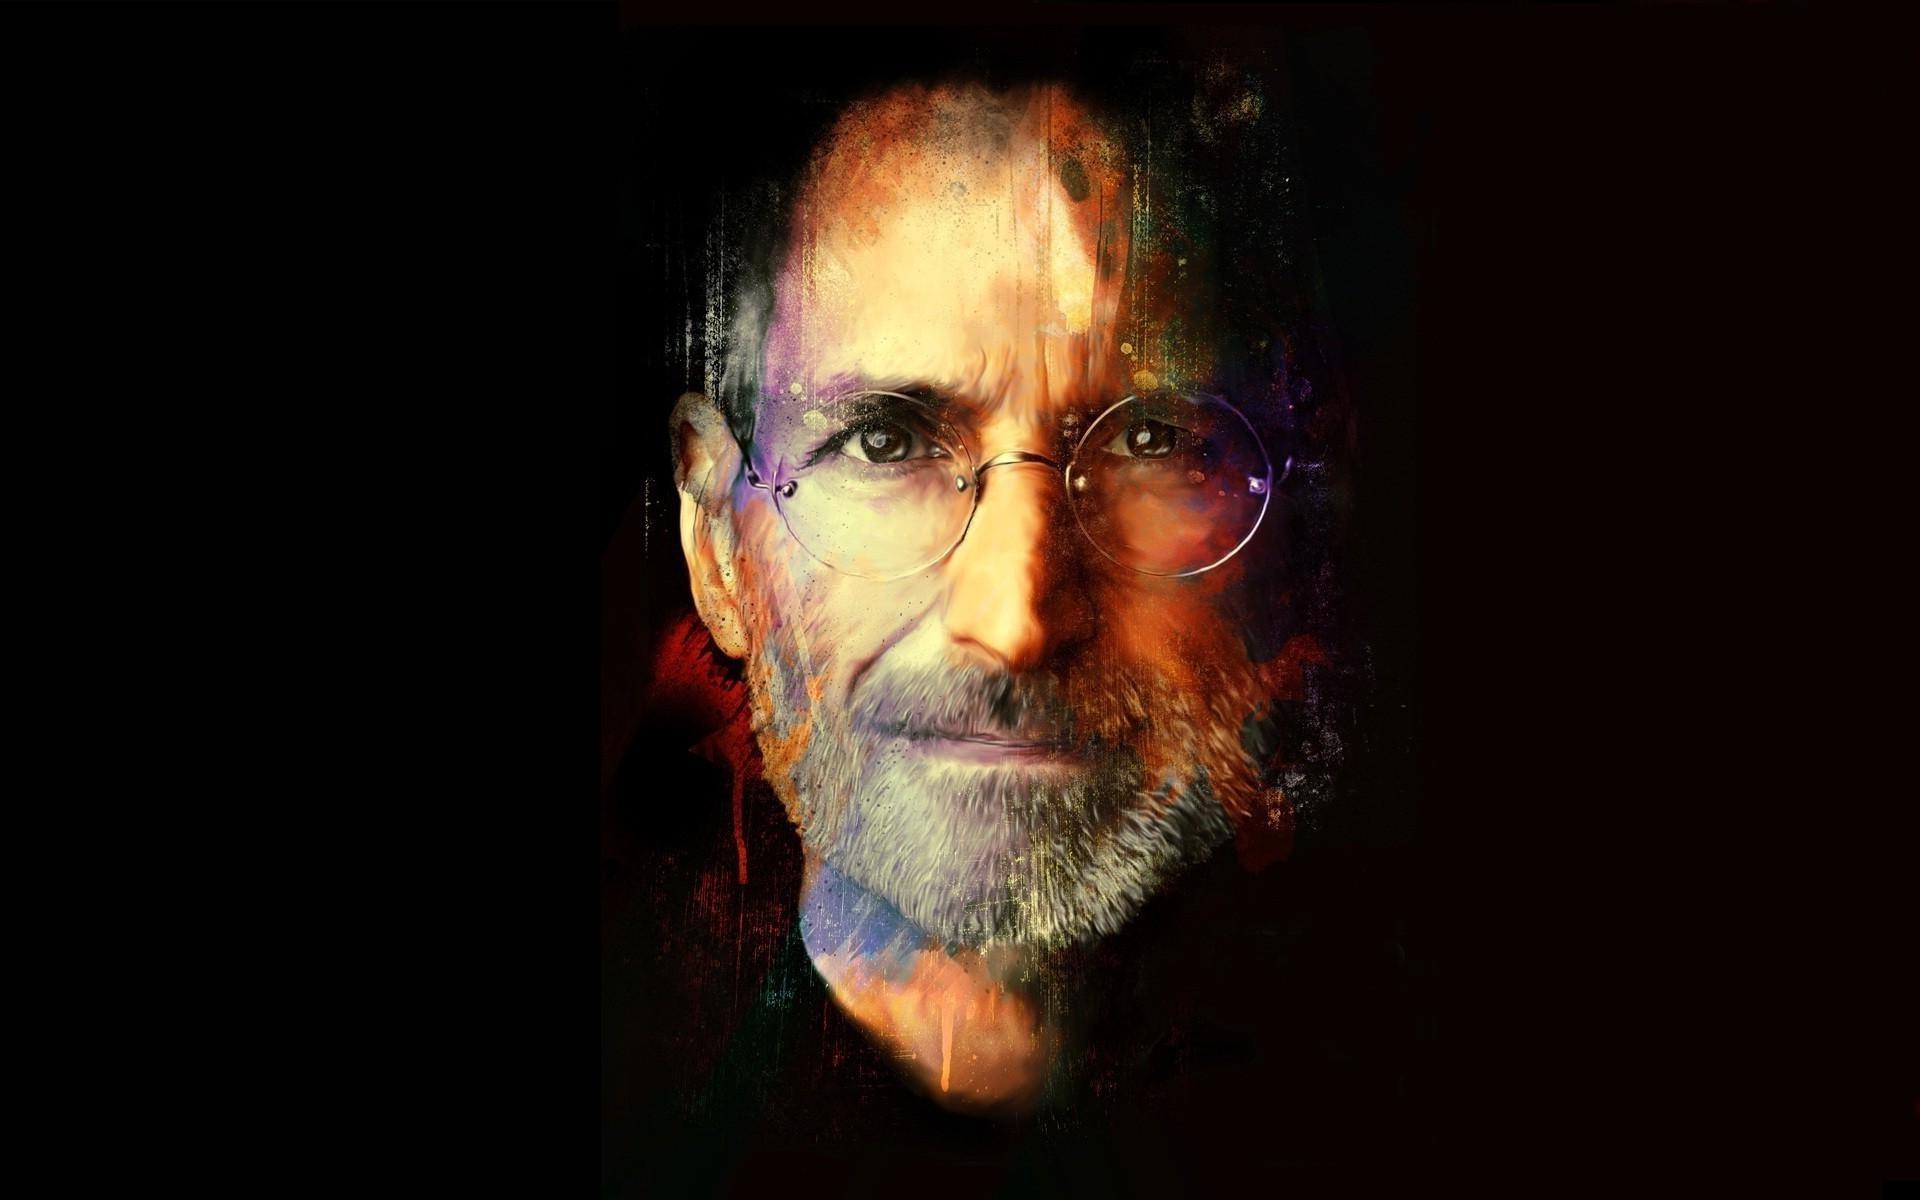 Как Стив Джобс отреагировал на уход из Apple Джона Рубинштейна